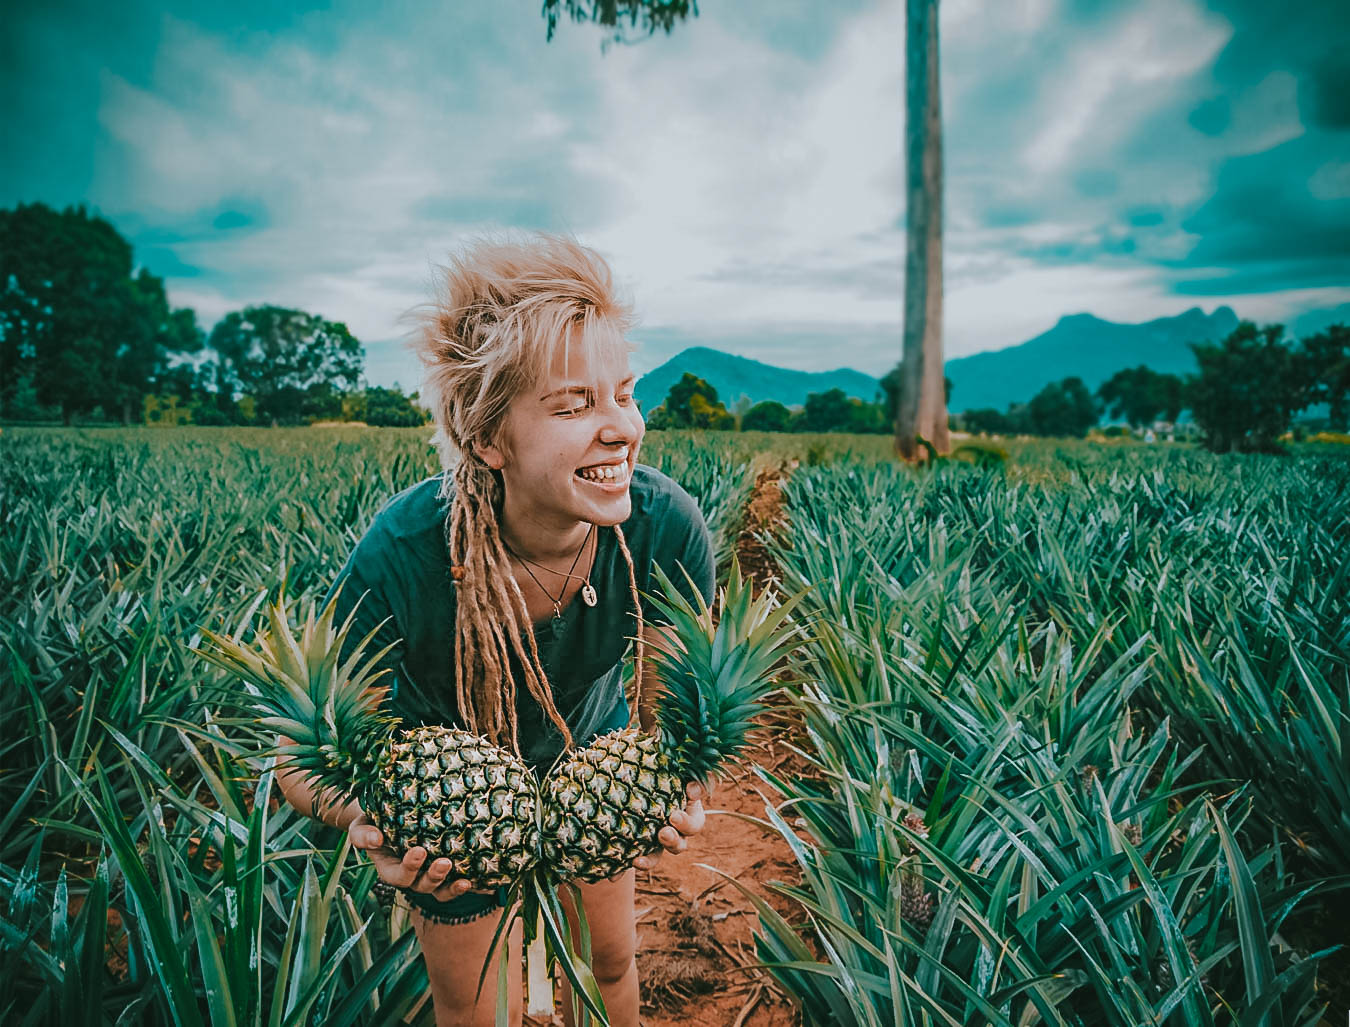 pineapple plantation farm local culture thailand south east asia